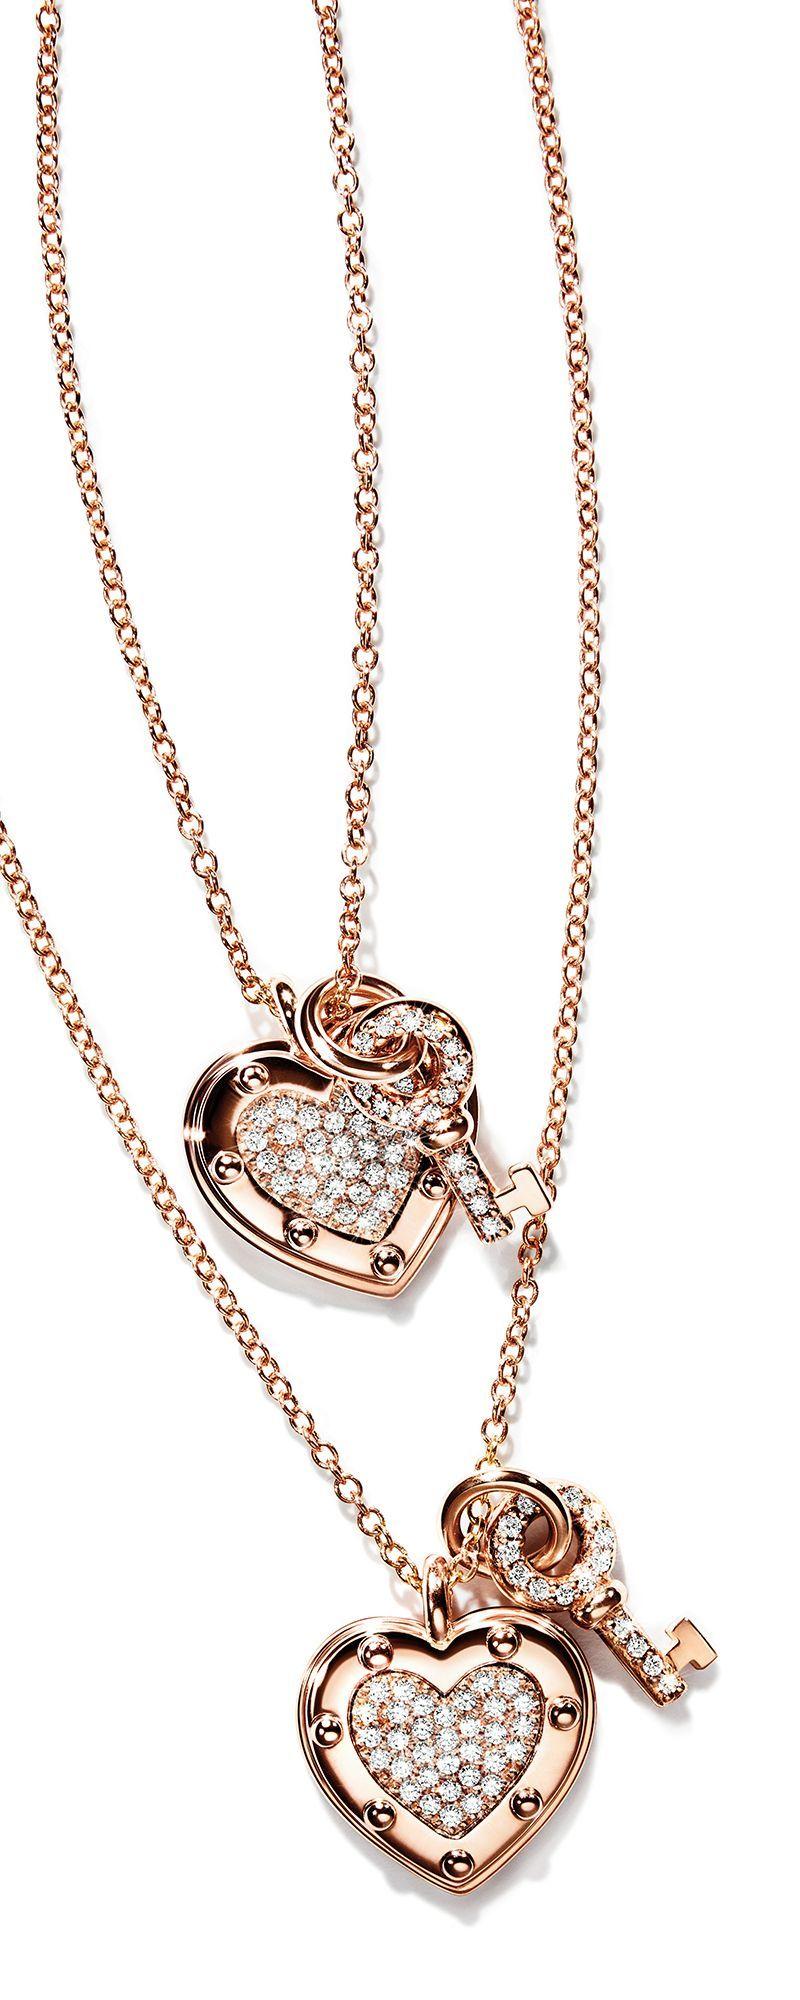 Return to tiffany love heart tag key pendant key pendant tiffany tiffany co return to tiffanylove heart tag key pendant aloadofball Gallery